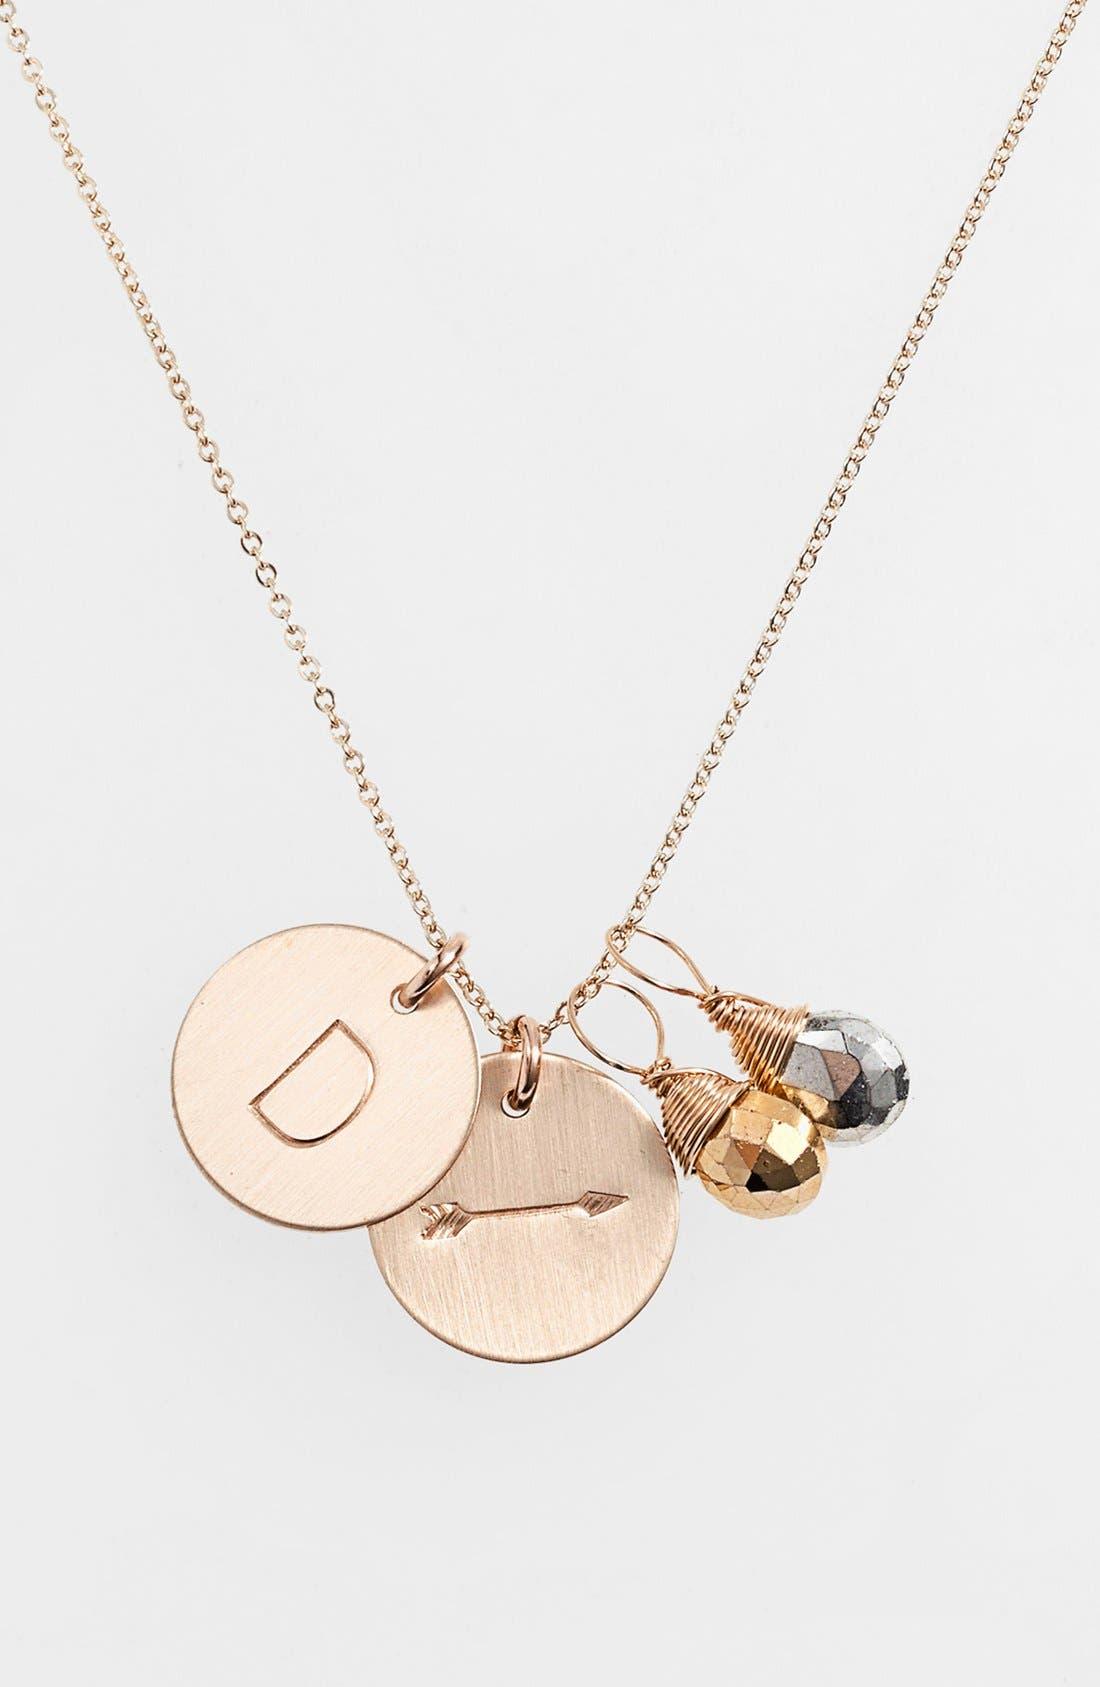 NASHELLE, Pyrite Initial & Arrow 14k-Gold Fill Disc Necklace, Main thumbnail 1, color, GOLD PYRITE/ SILVER PYRITE D